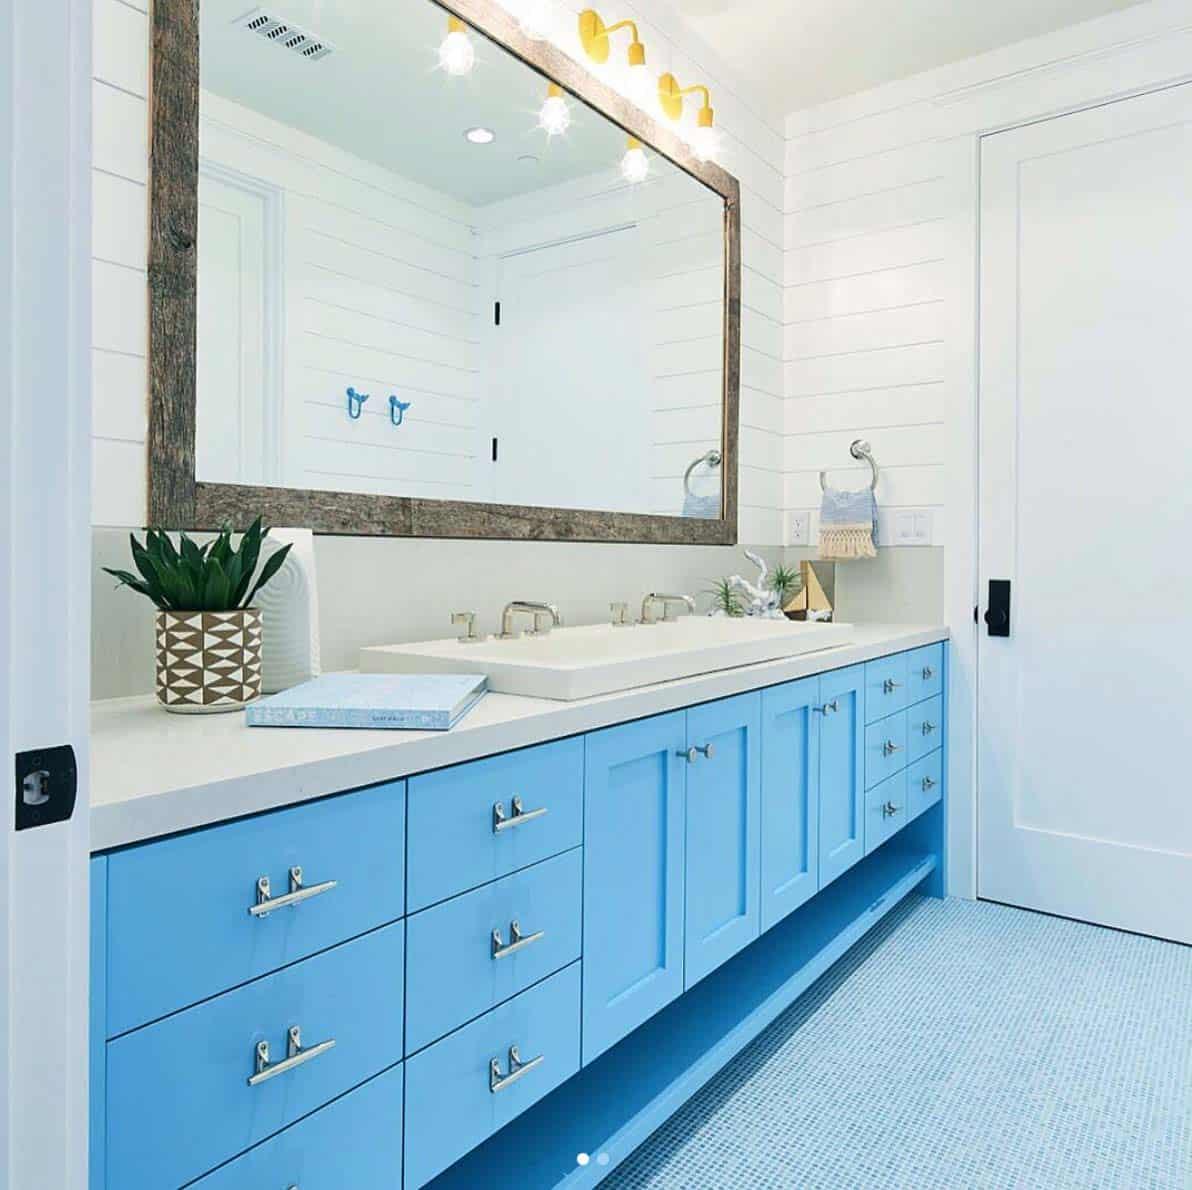 salle-de-bains-de-ferme-moderne